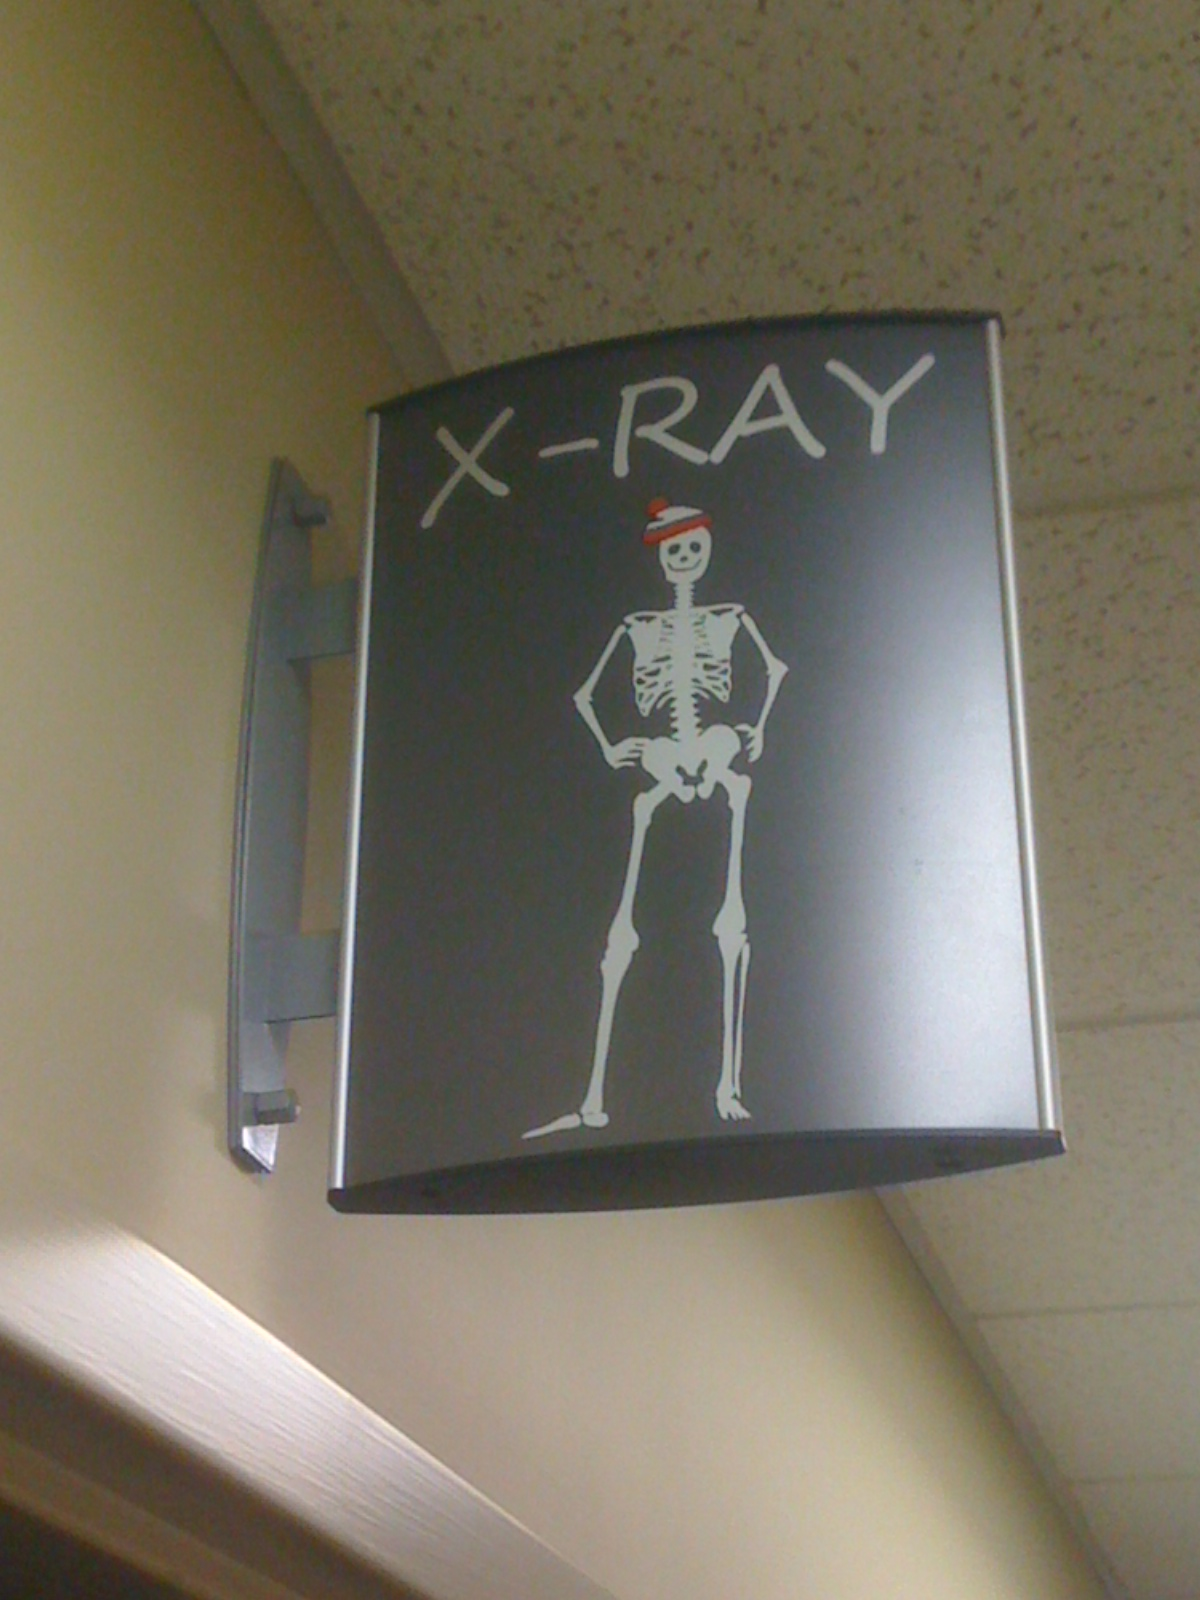 WC Ped Ortho Xray.JPG